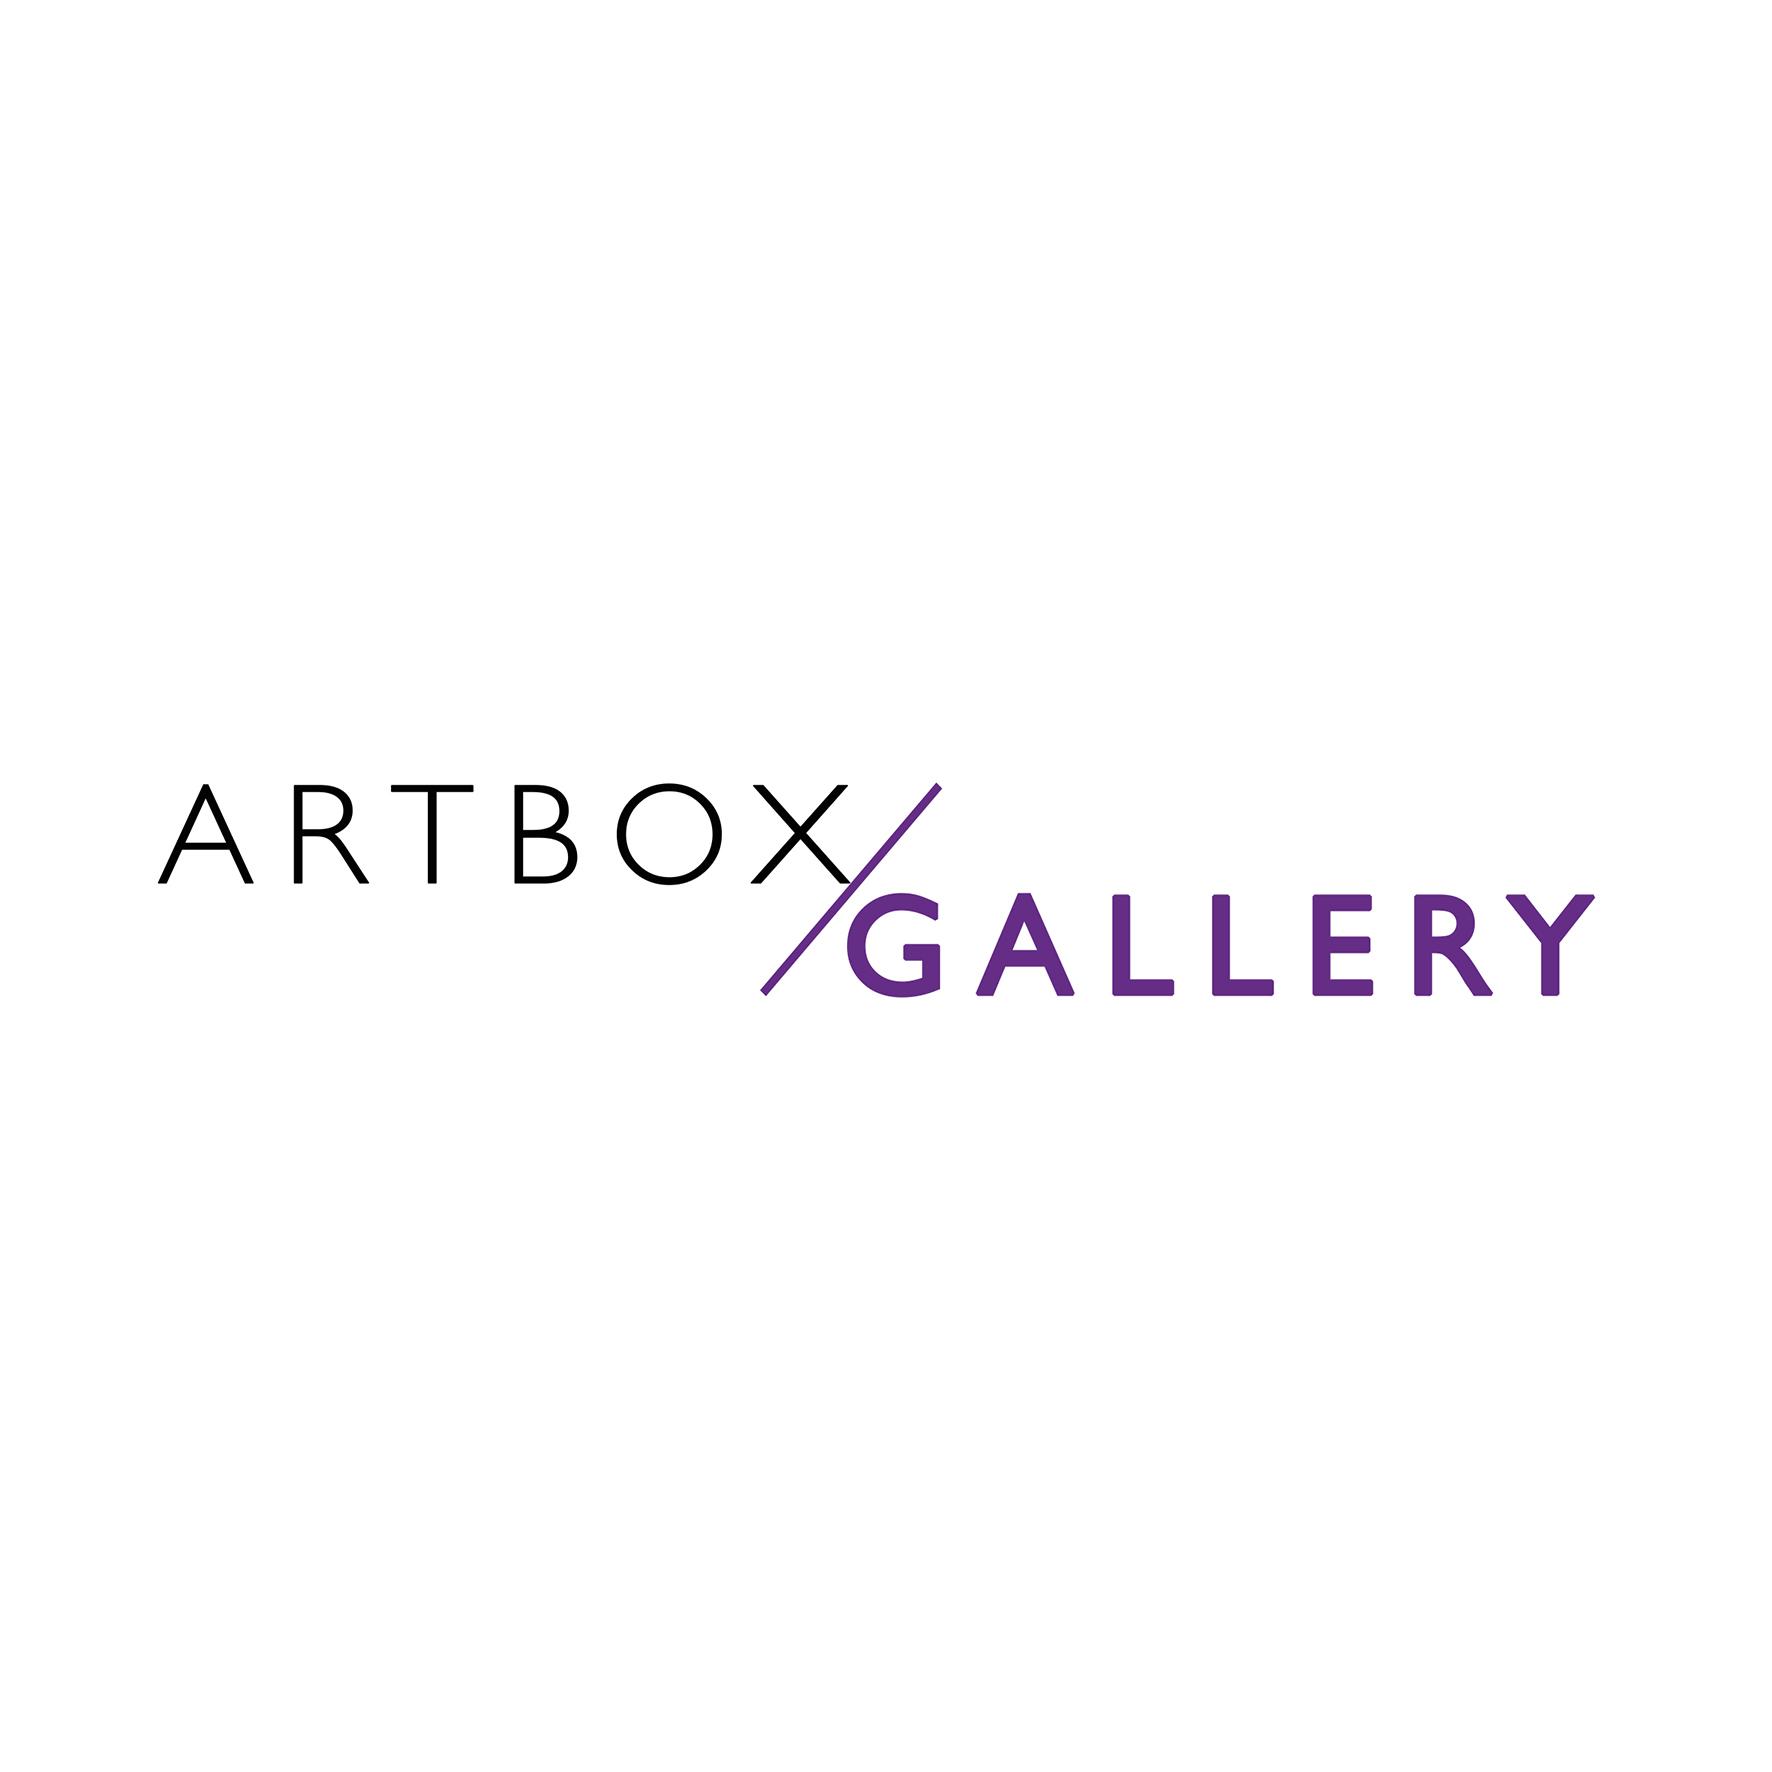 ARTBOX.GALLERY